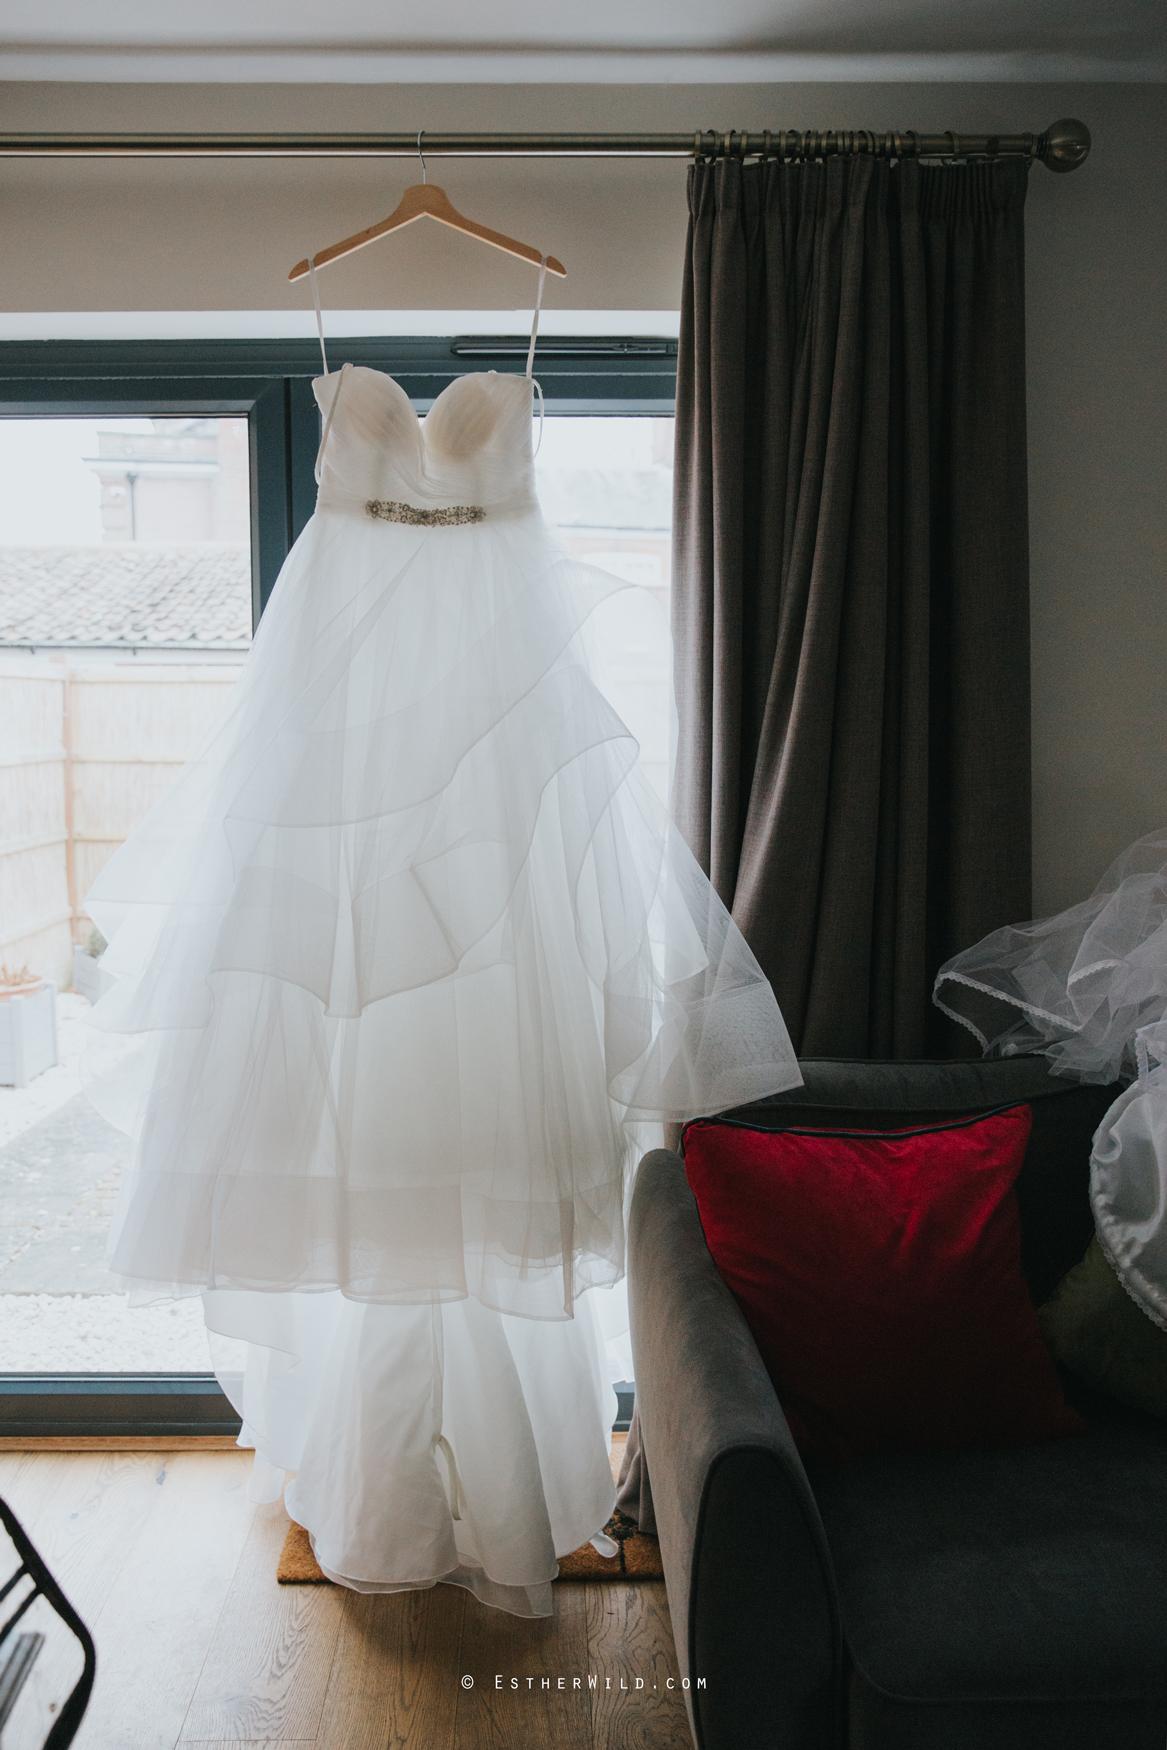 Norfolk_Mead_Hotel_Norwich_Wedding_Copyright_Esther_Wild_Photographer_Norfolk_Mead_Hotel_Norwich_Wedding_Copyright_Esther_Wild_Photographer_IMG_0013.jpg